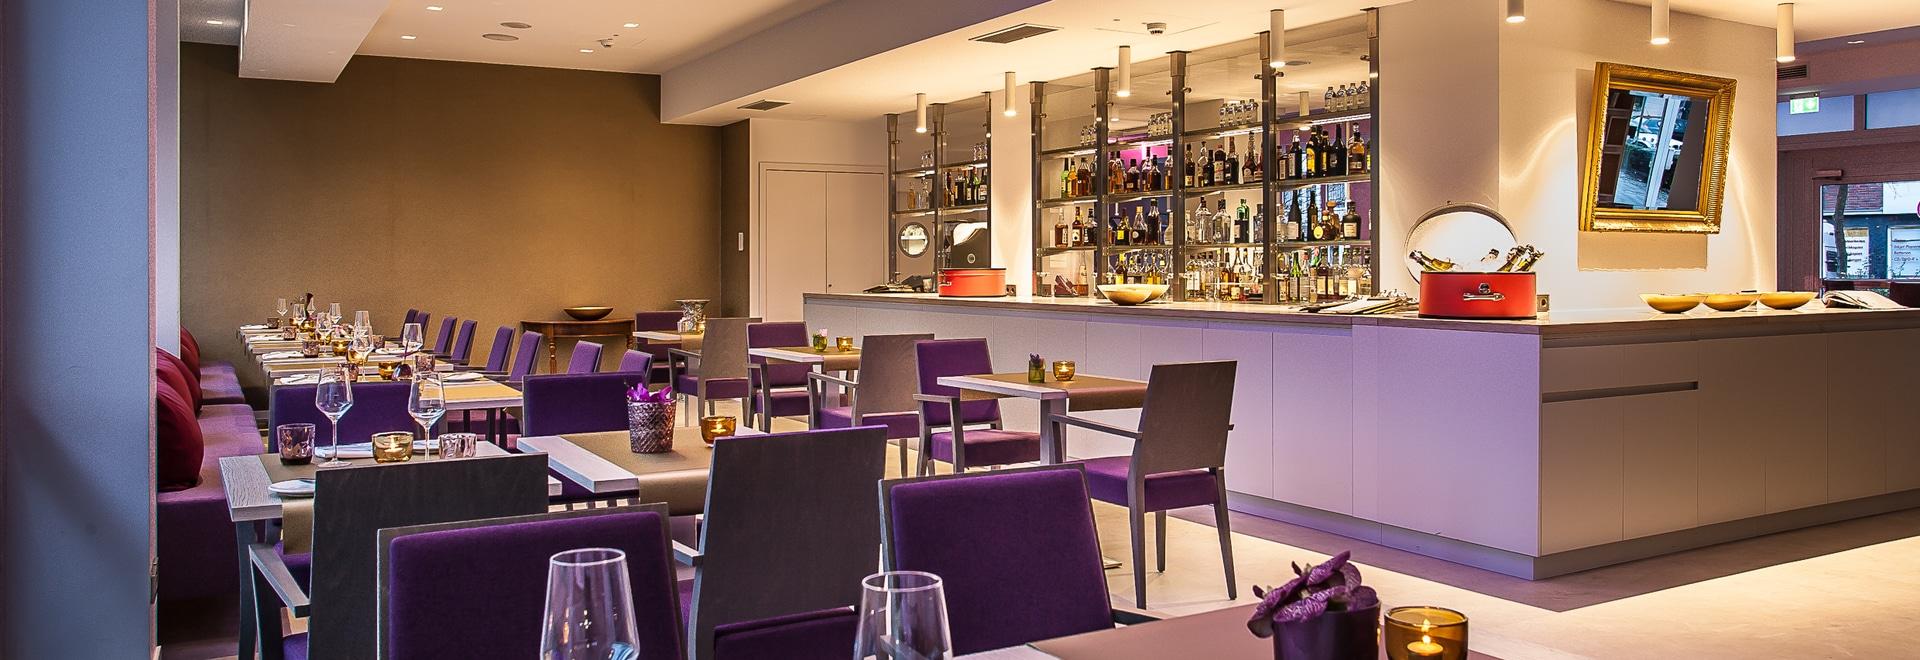 Hotel Indigo Dusseldorf dining room